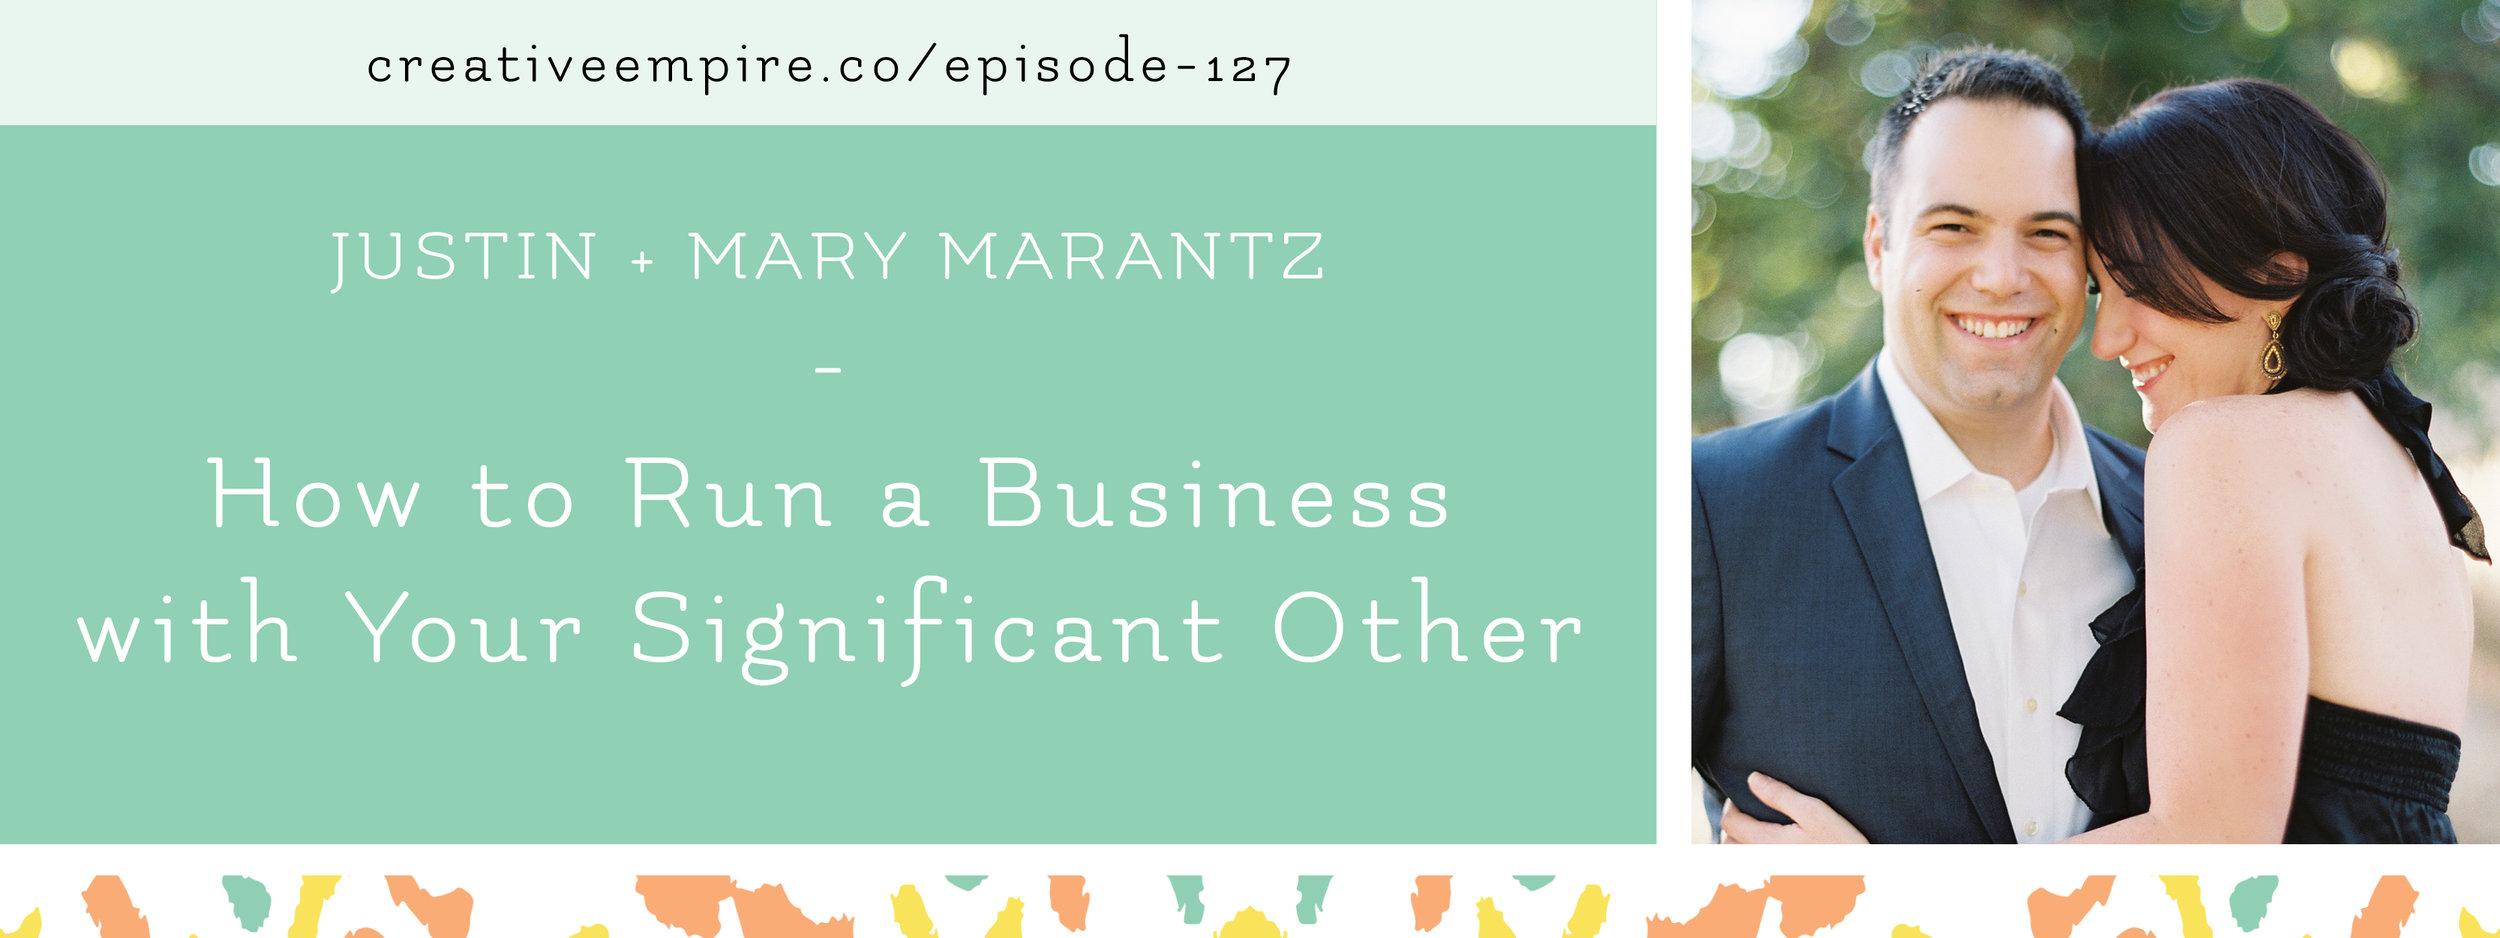 Email Header | Episode 127 | Justin + Mary Marantz